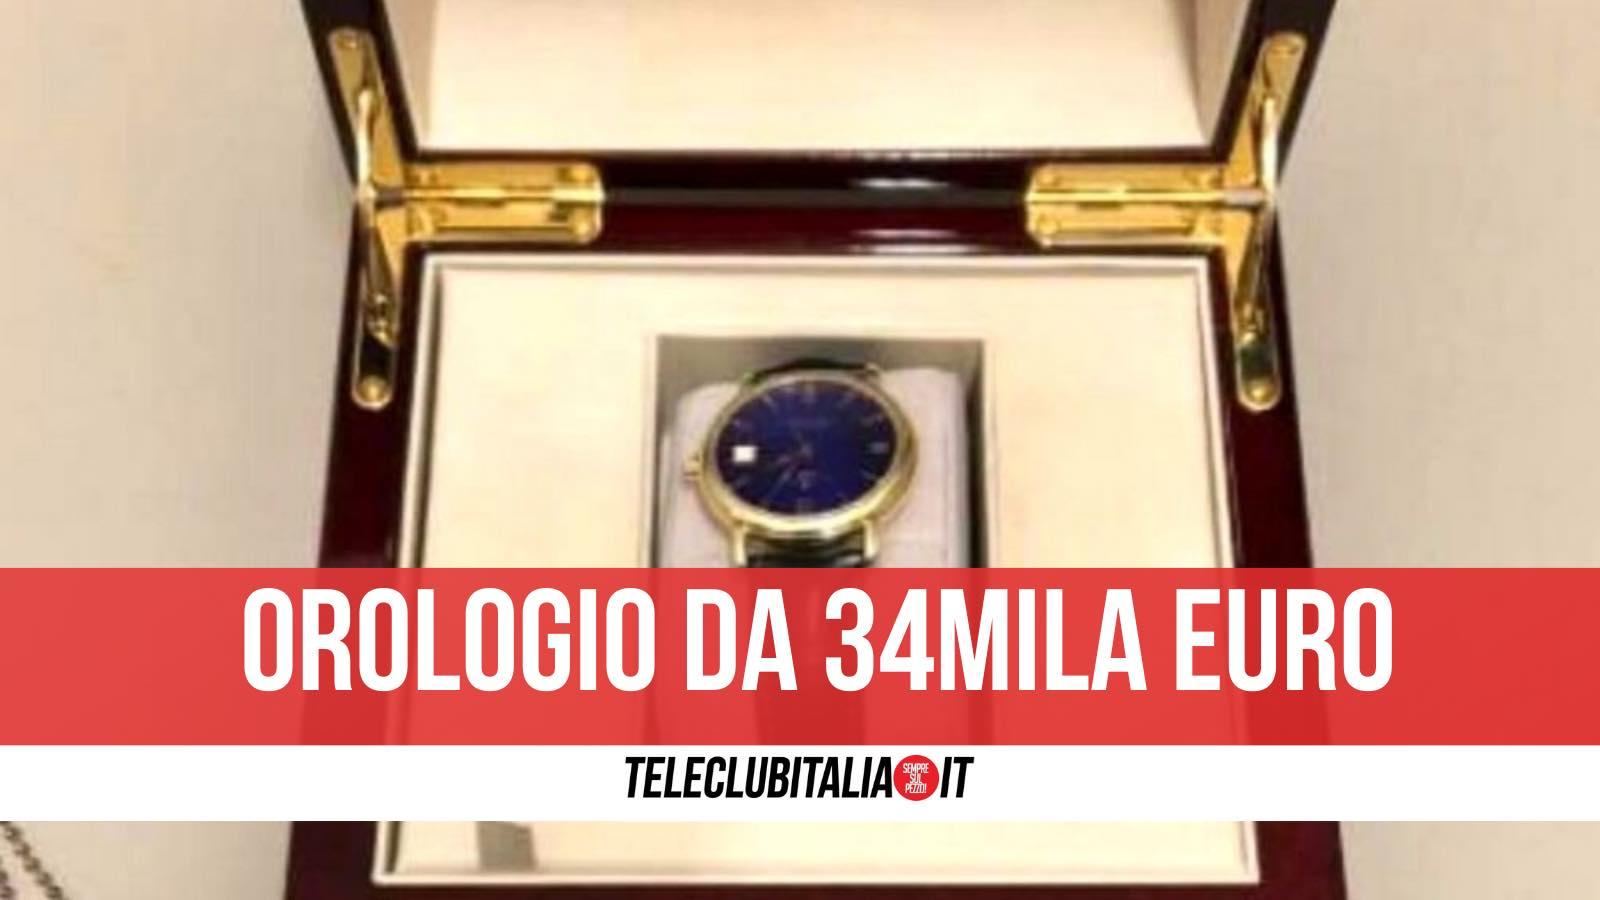 como orologio 34mila euro dogane